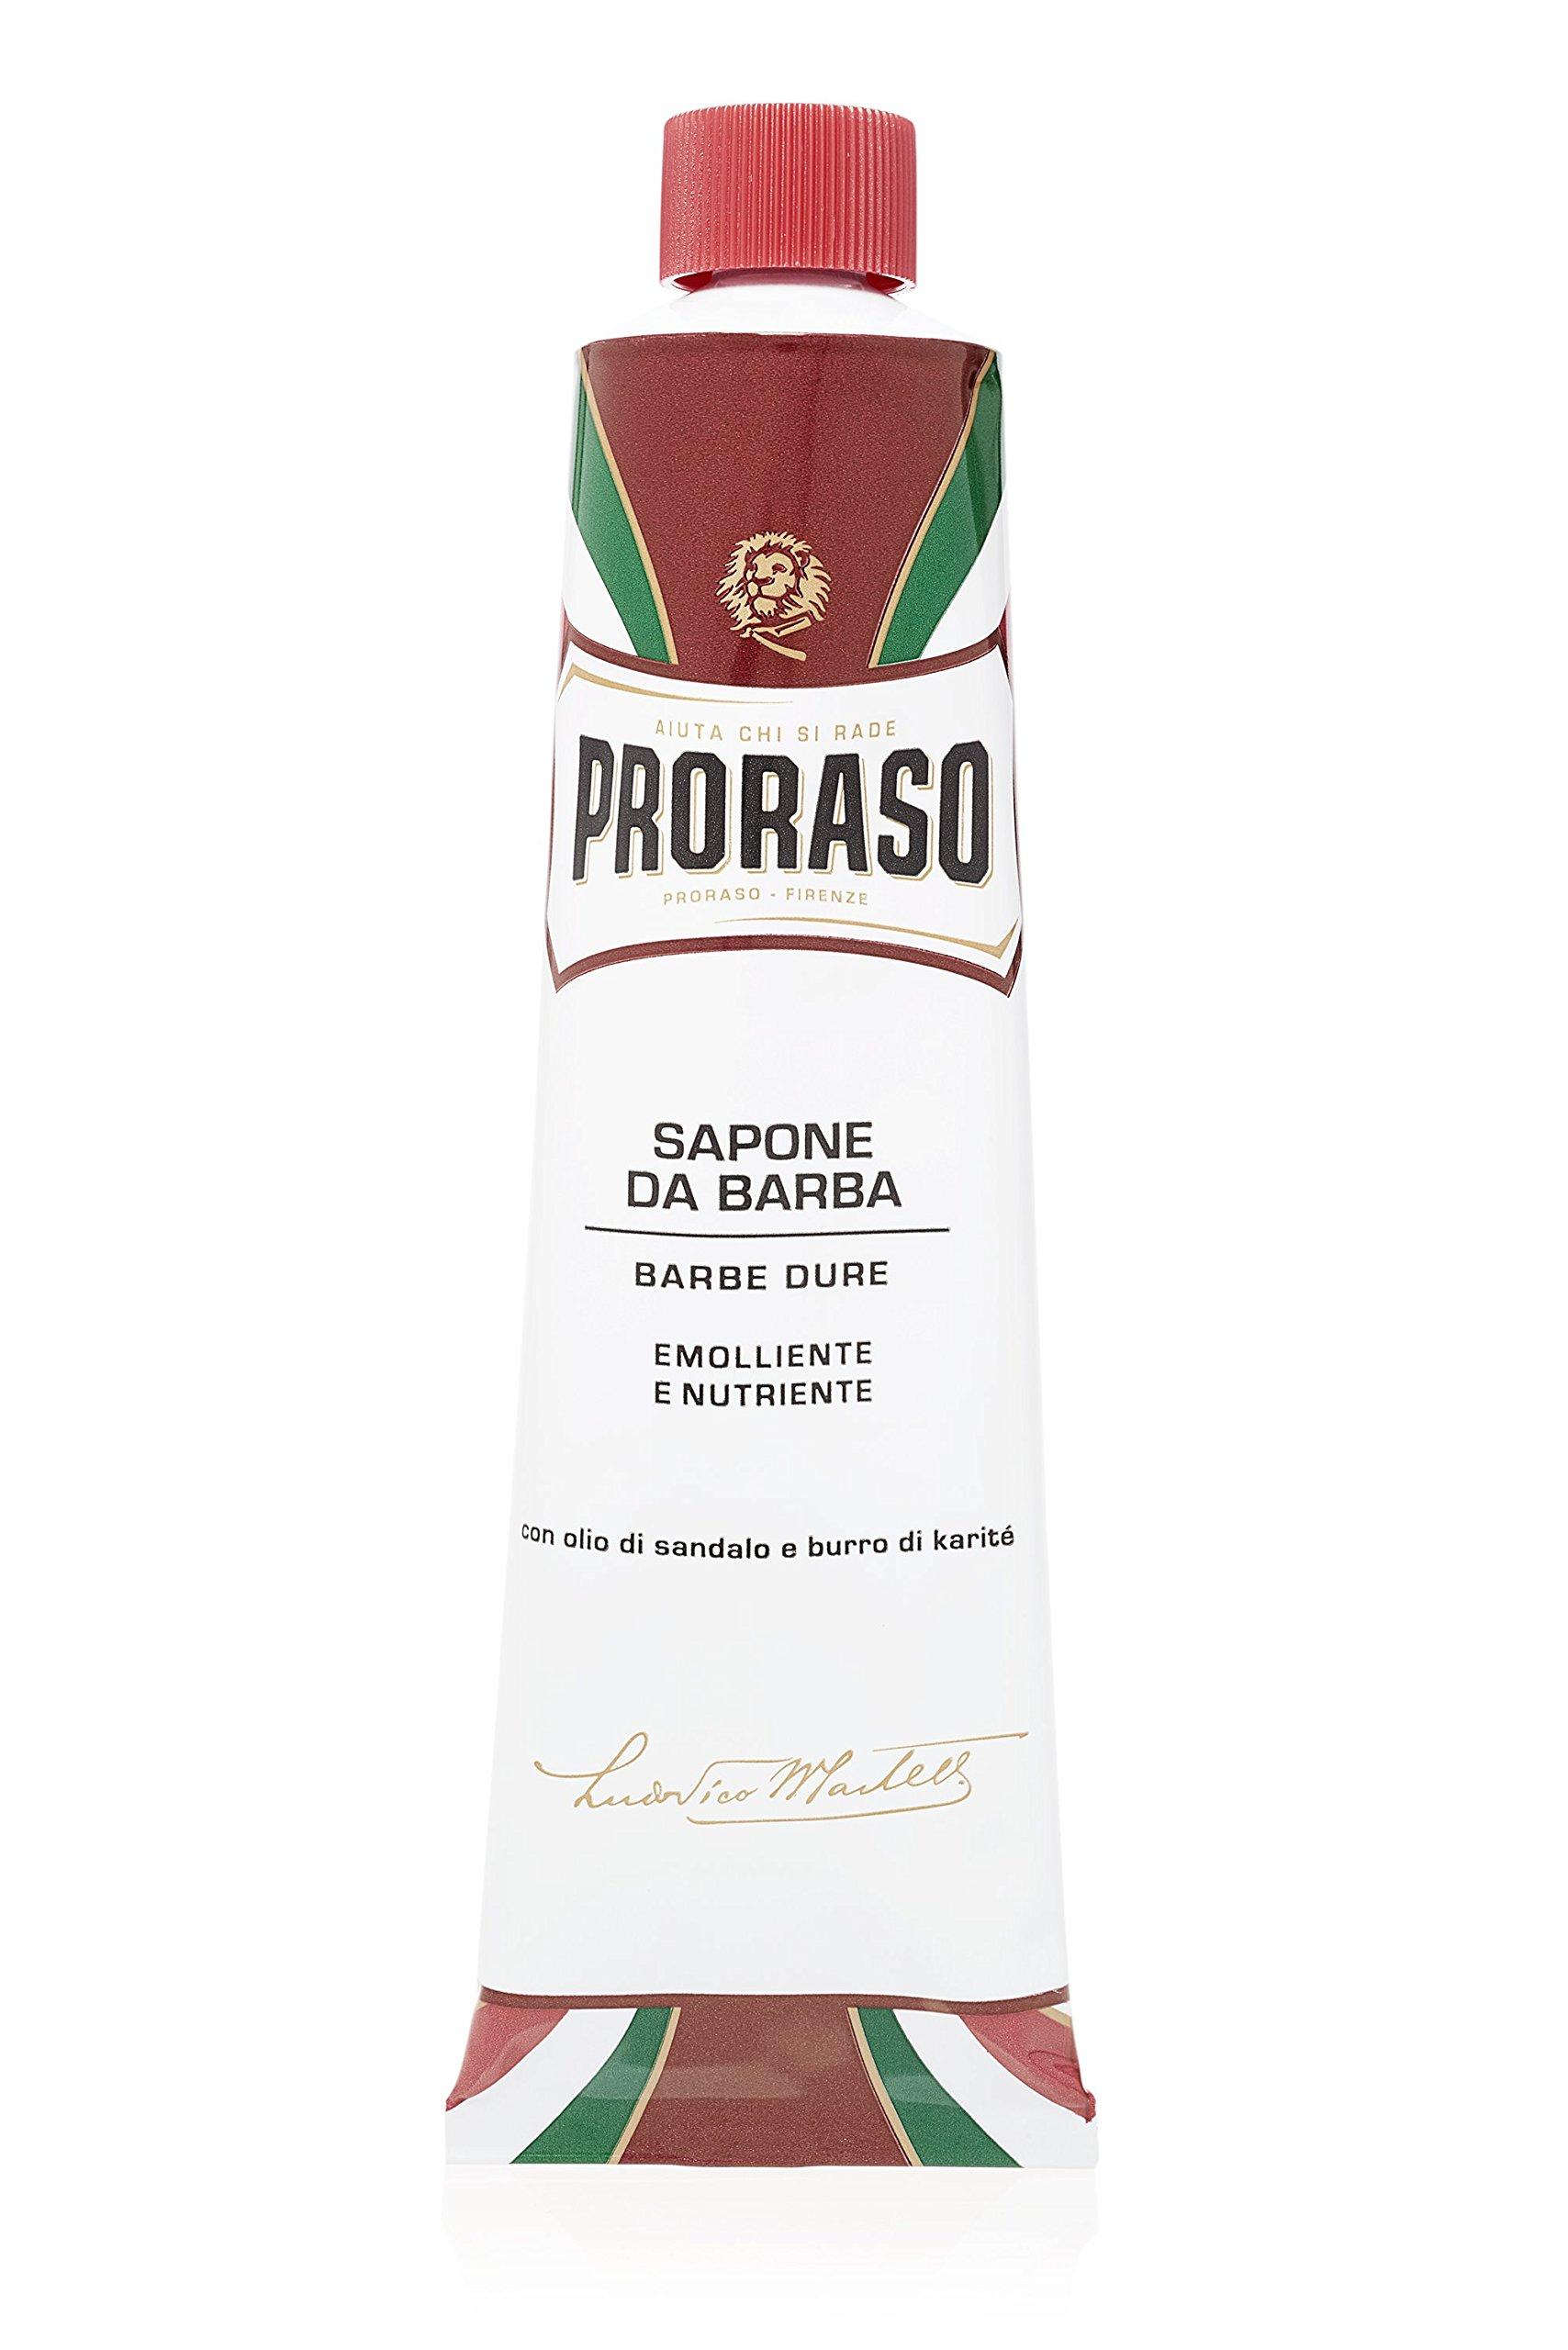 Proraso Shaving Cream, Moisturizing and Nourishing, 5.2 oz